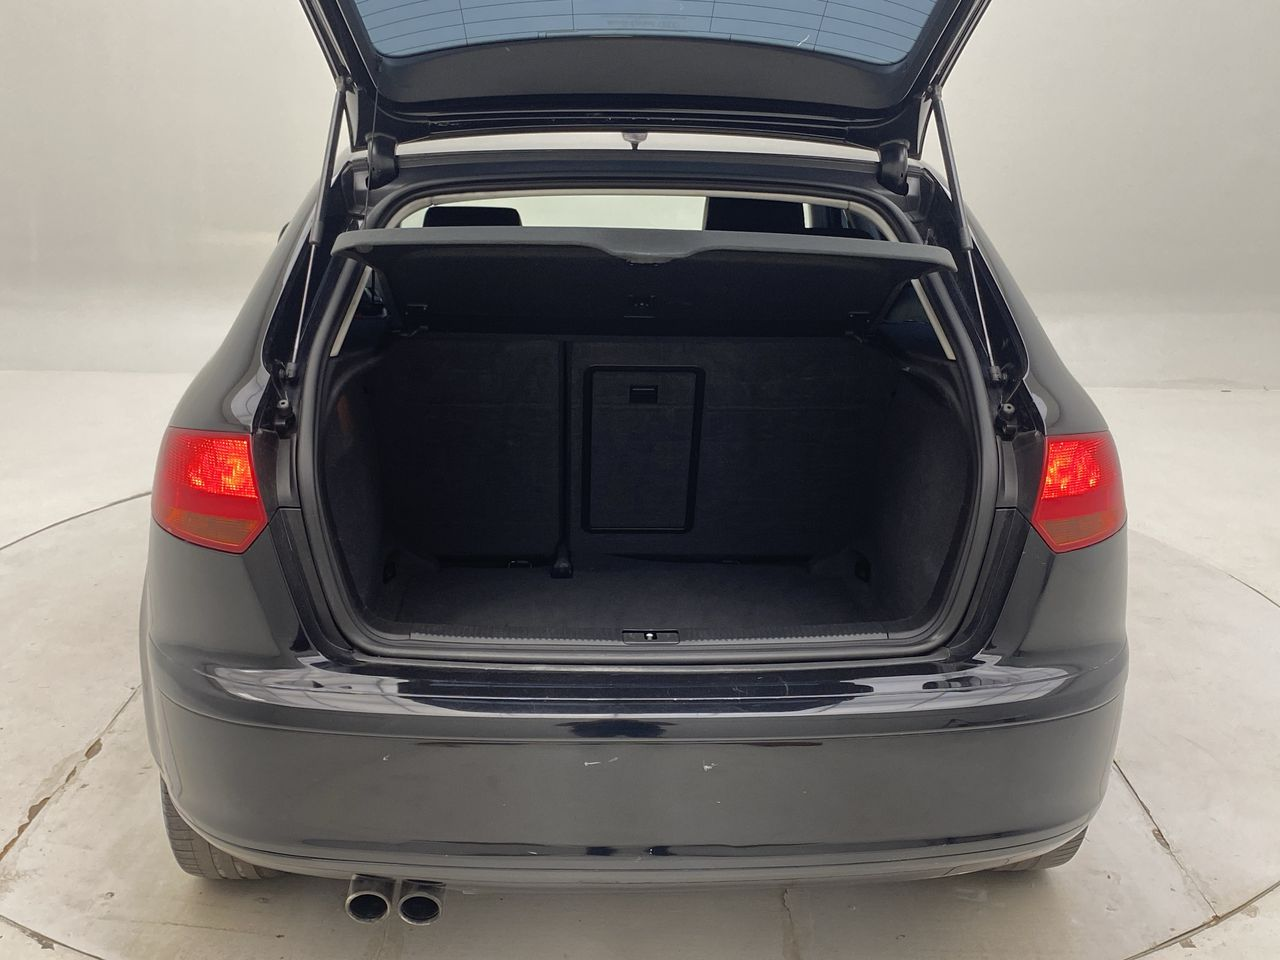 a3 sportback 2.0 16v tfsi s-tronic